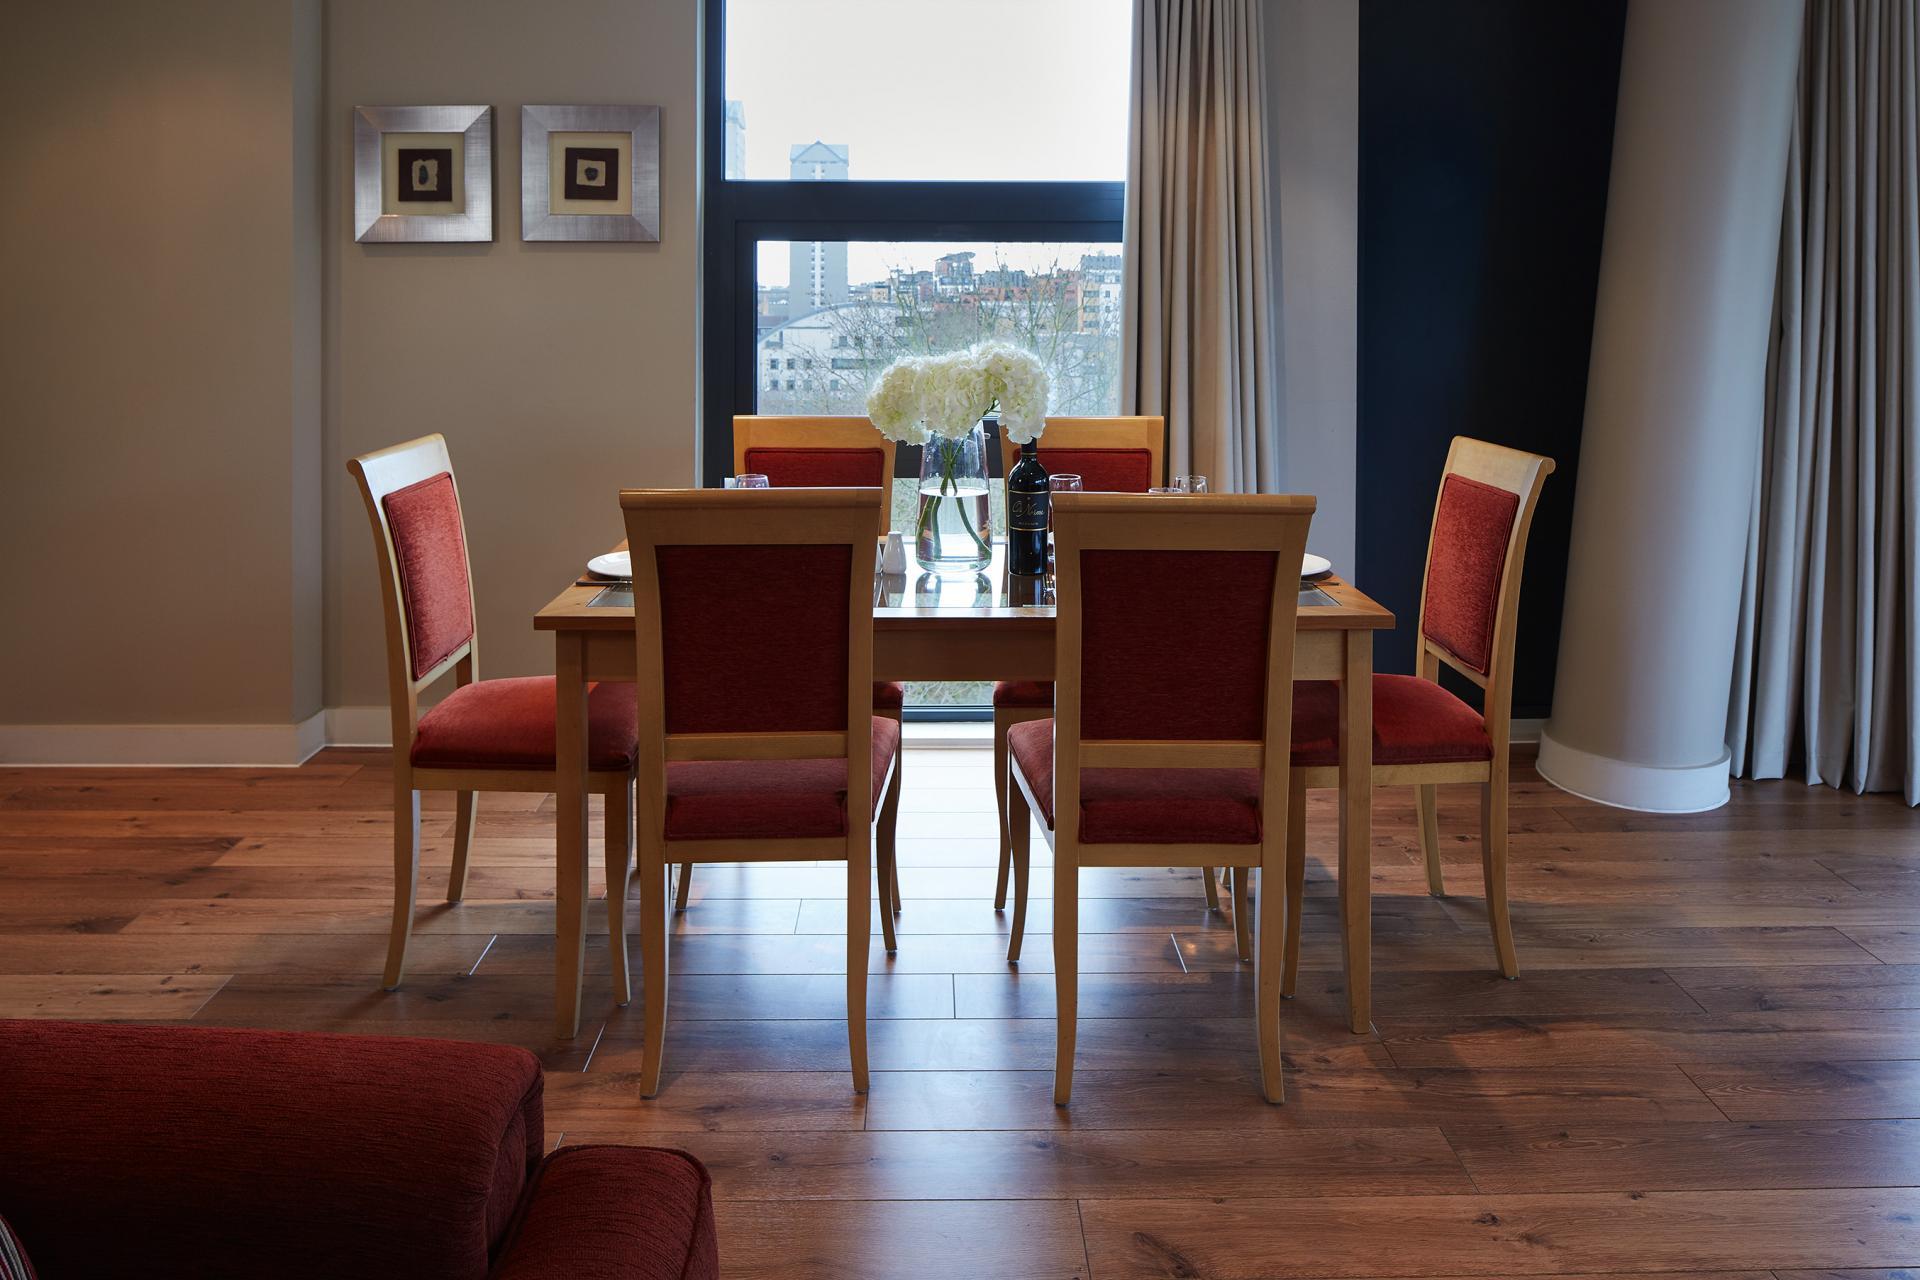 Dining area at Marlin Canary Wharf Apartments, Canary Wharf, London